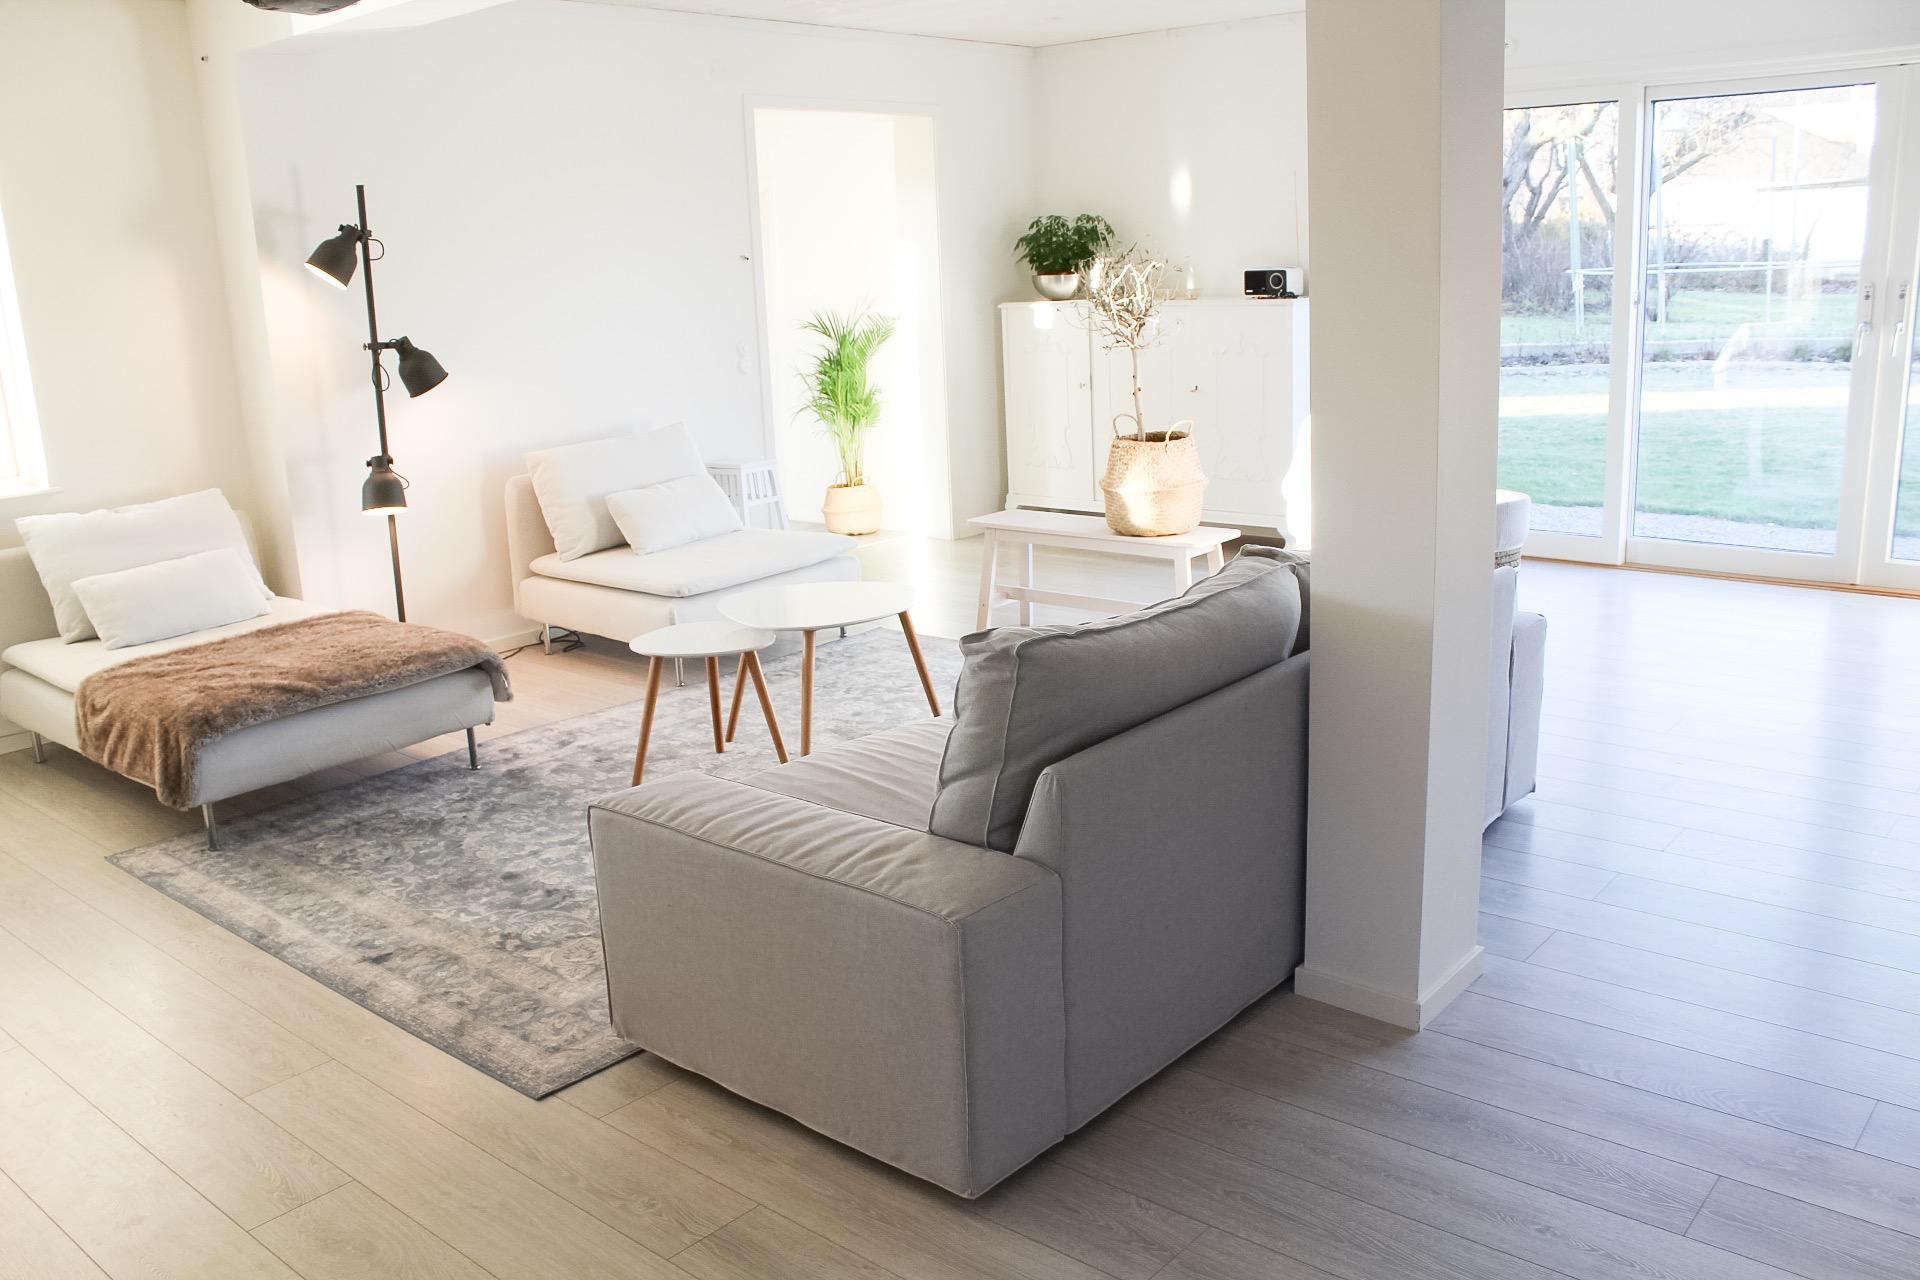 Vardagsrummet tar form